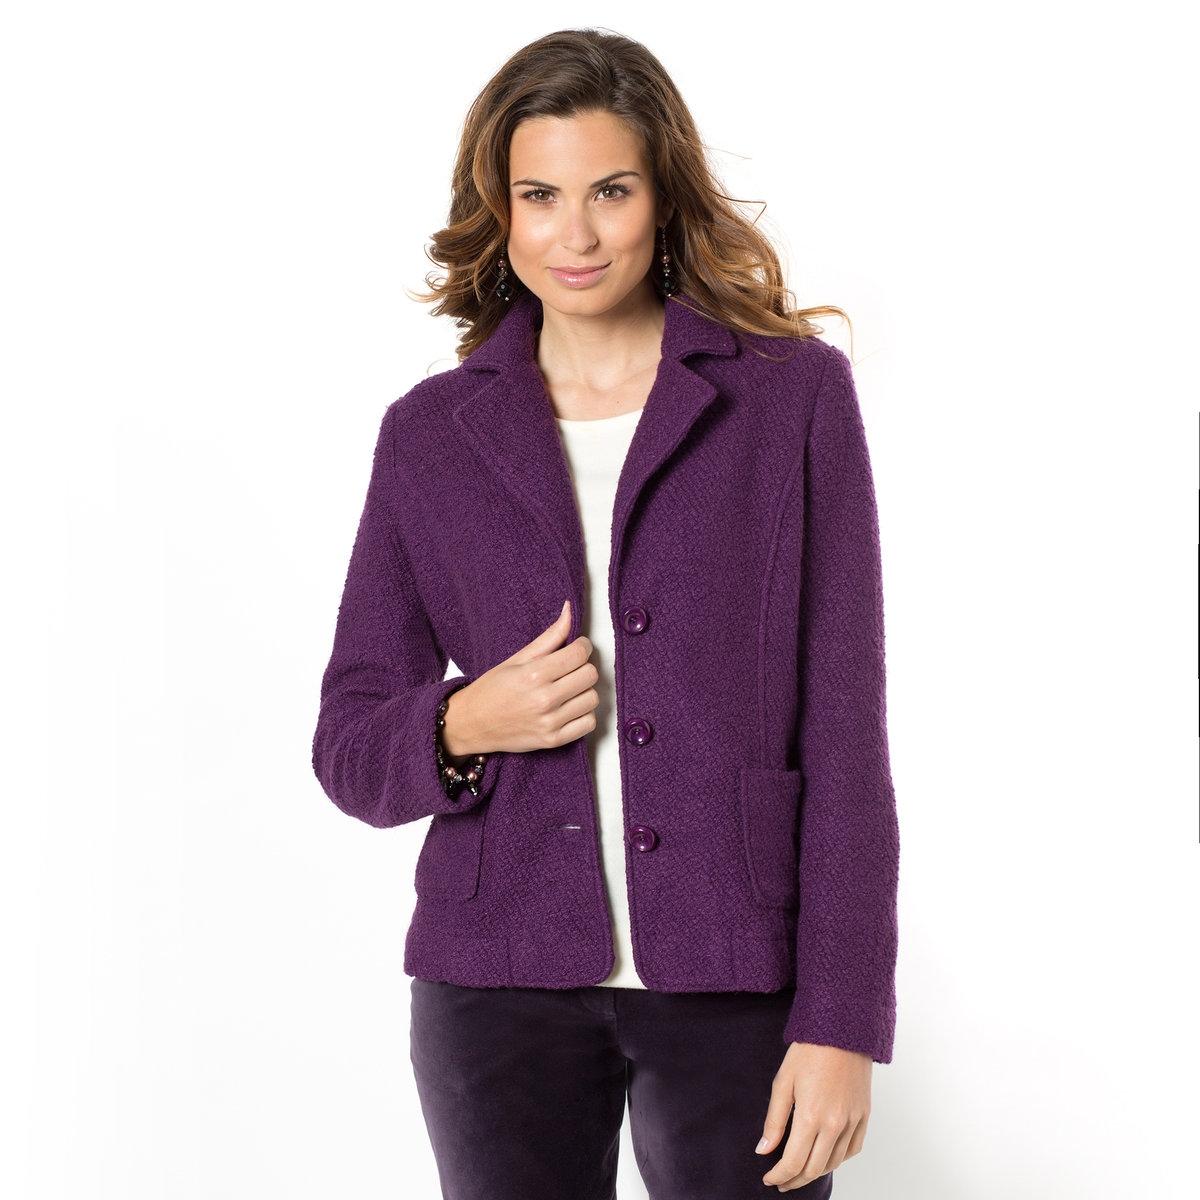 Жакет, 26% шерсти<br><br>Цвет: фиолетовый<br>Размер: 40 (FR) - 46 (RUS)